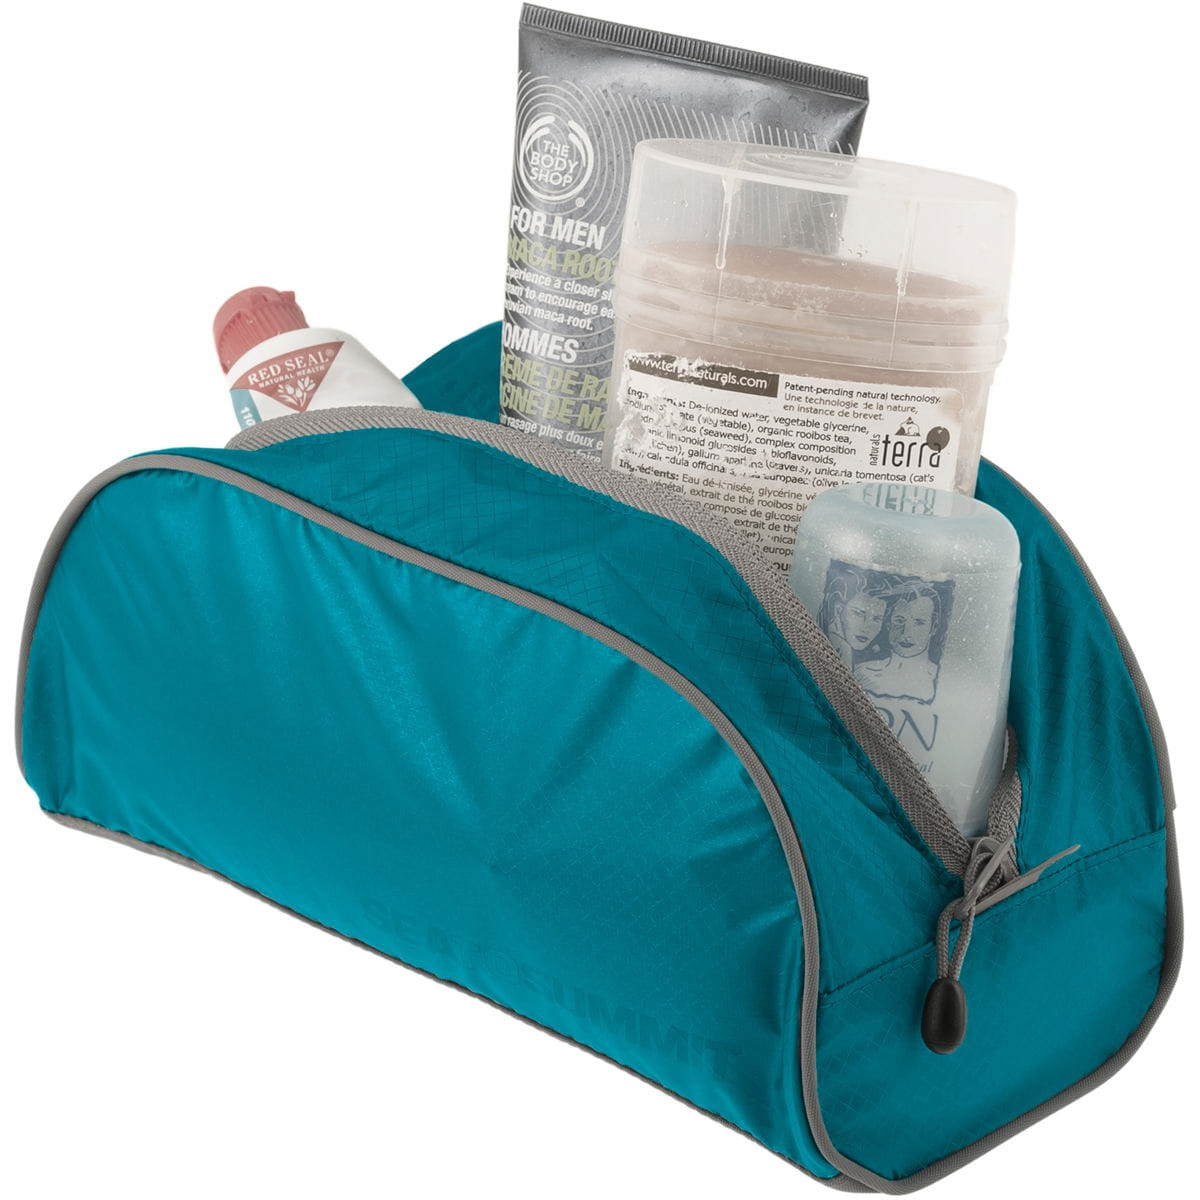 Sea to Summit TravellingLight™ Toiletry Bag S - Waschtasche - Bild 3